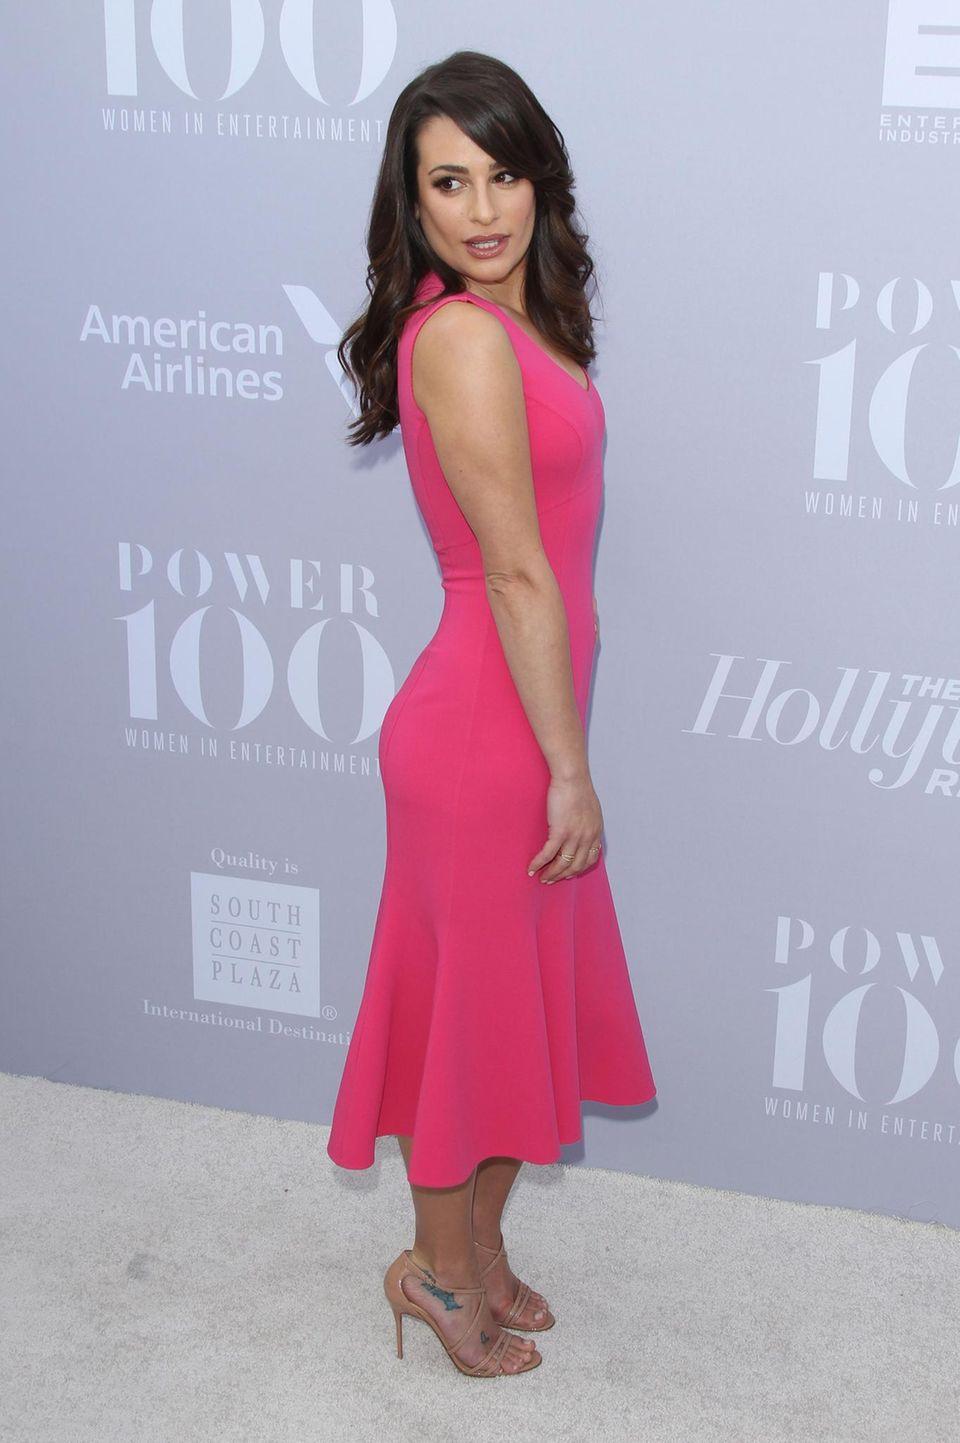 Schauspielerin Lea Michele